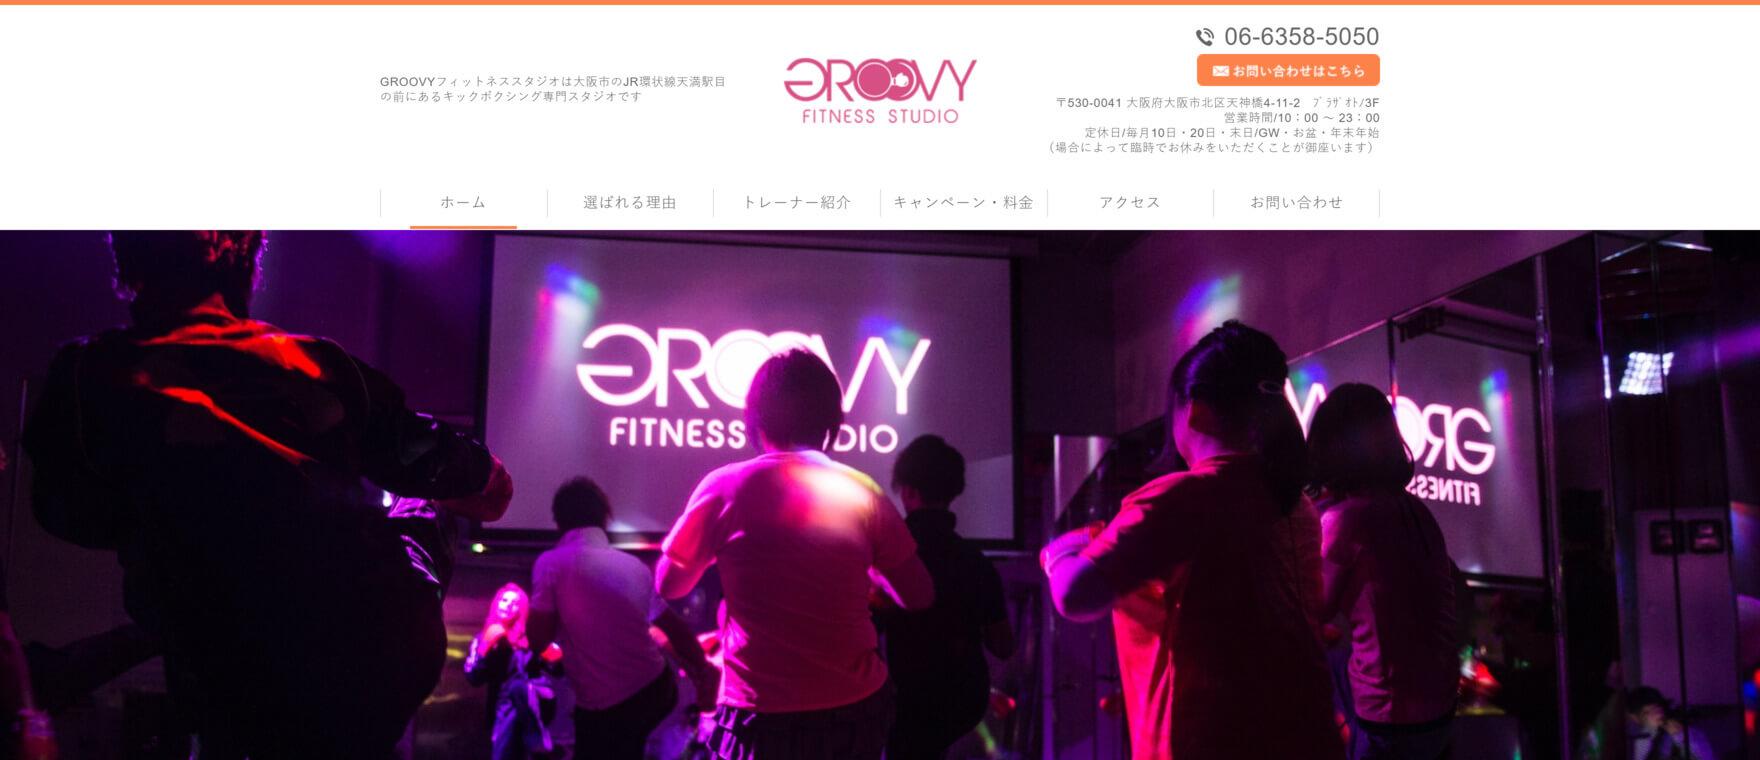 GROOVYのイメージ画像